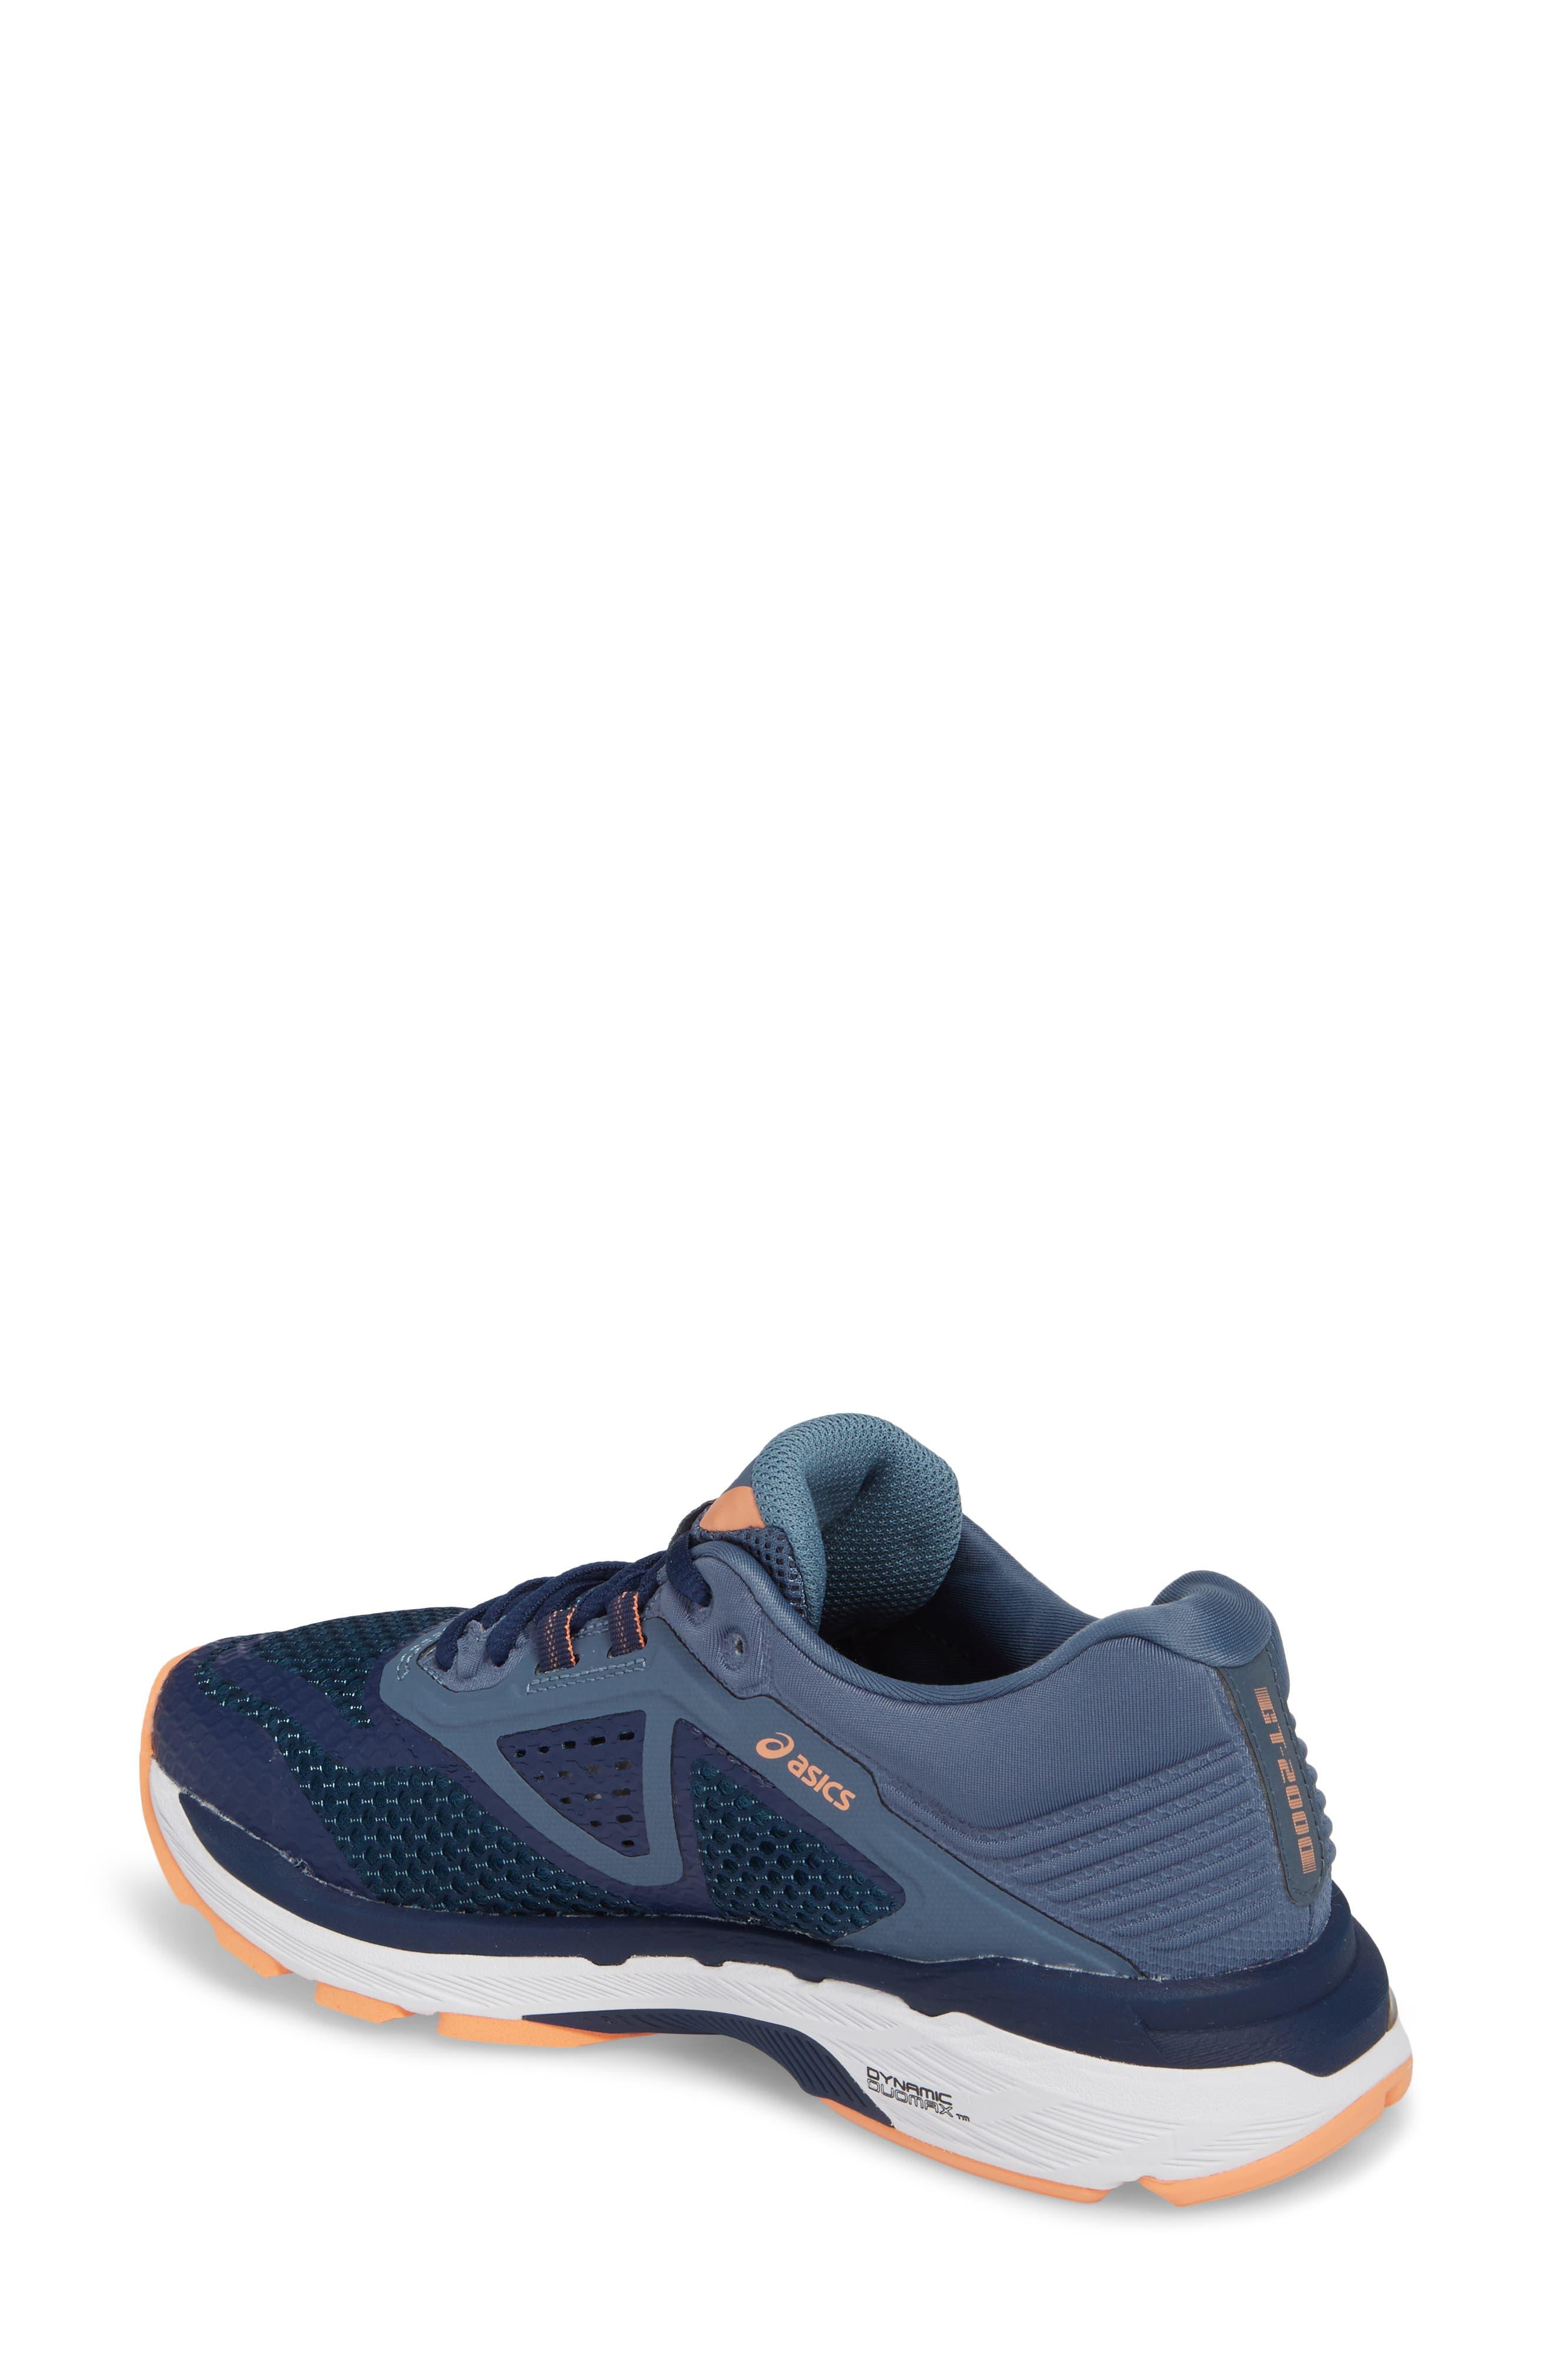 GT-2000 6 Running Shoe,                             Alternate thumbnail 2, color,                             Indigo Blue/ Smoke Blue